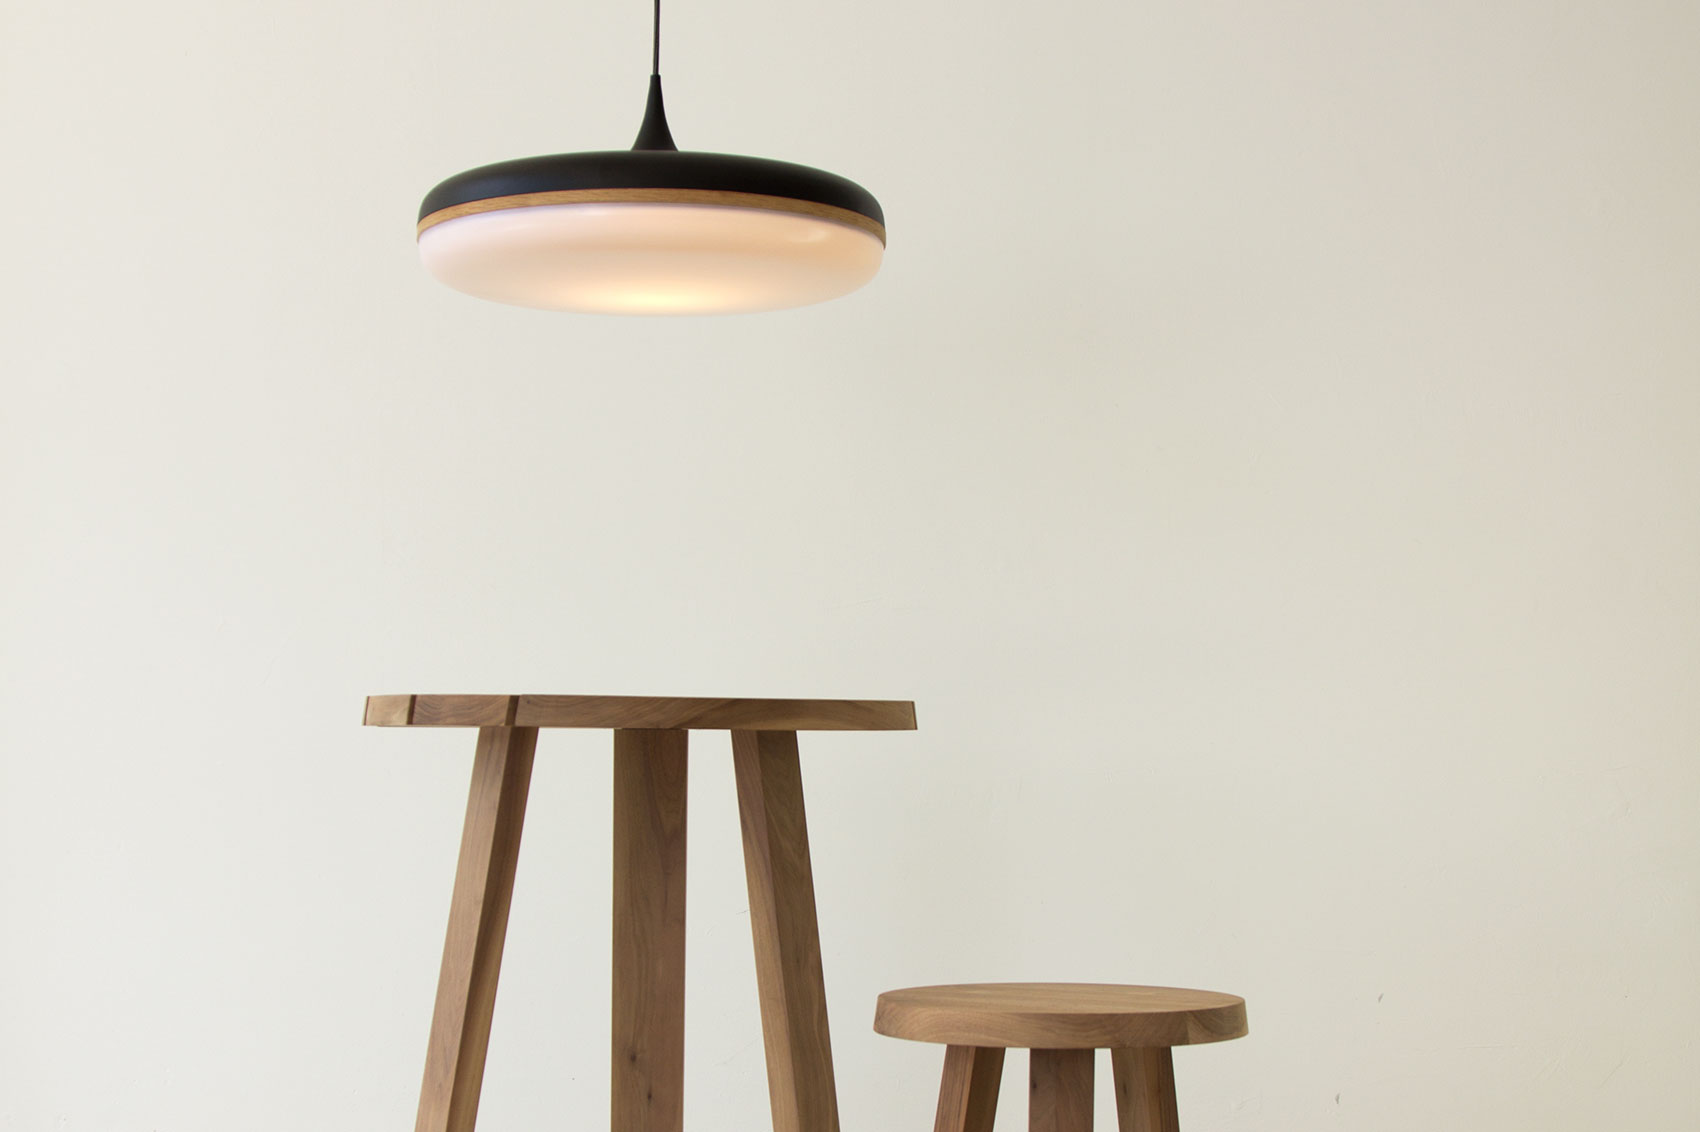 copper-lighting-droplet3.jpg